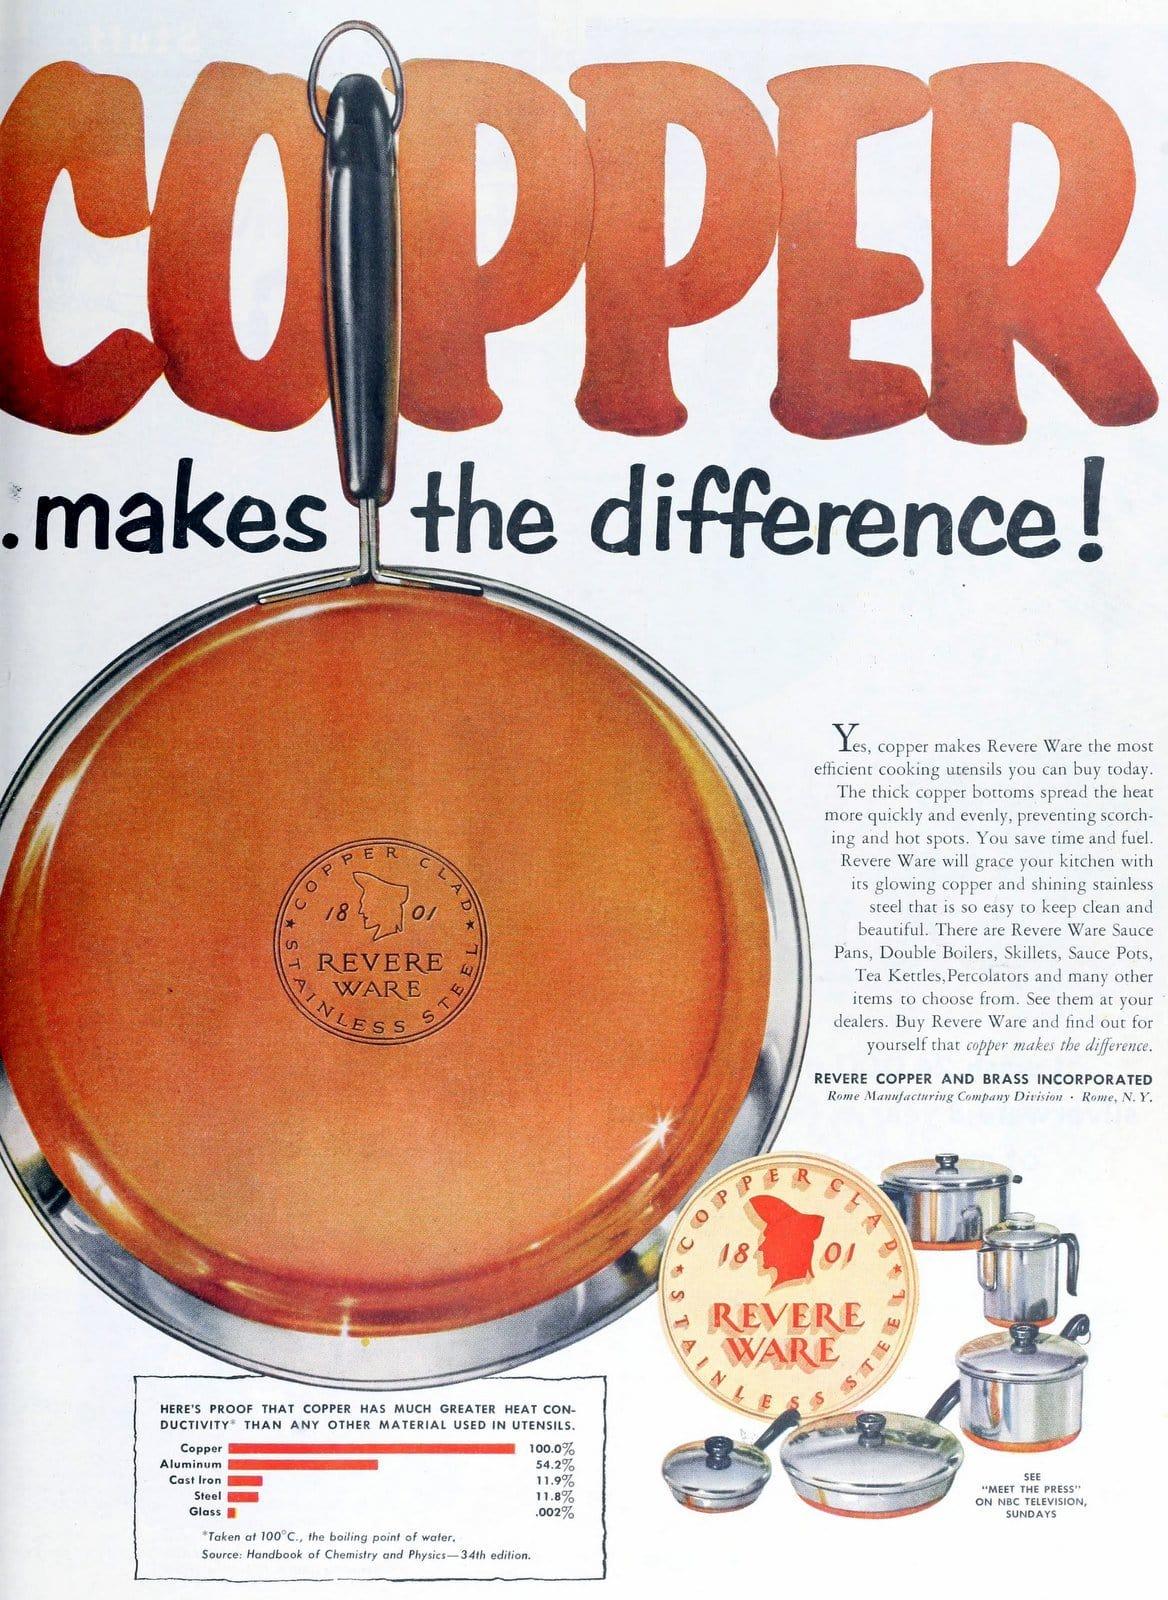 Vintage copper Revere Ware saucepans and frying pans (1954)